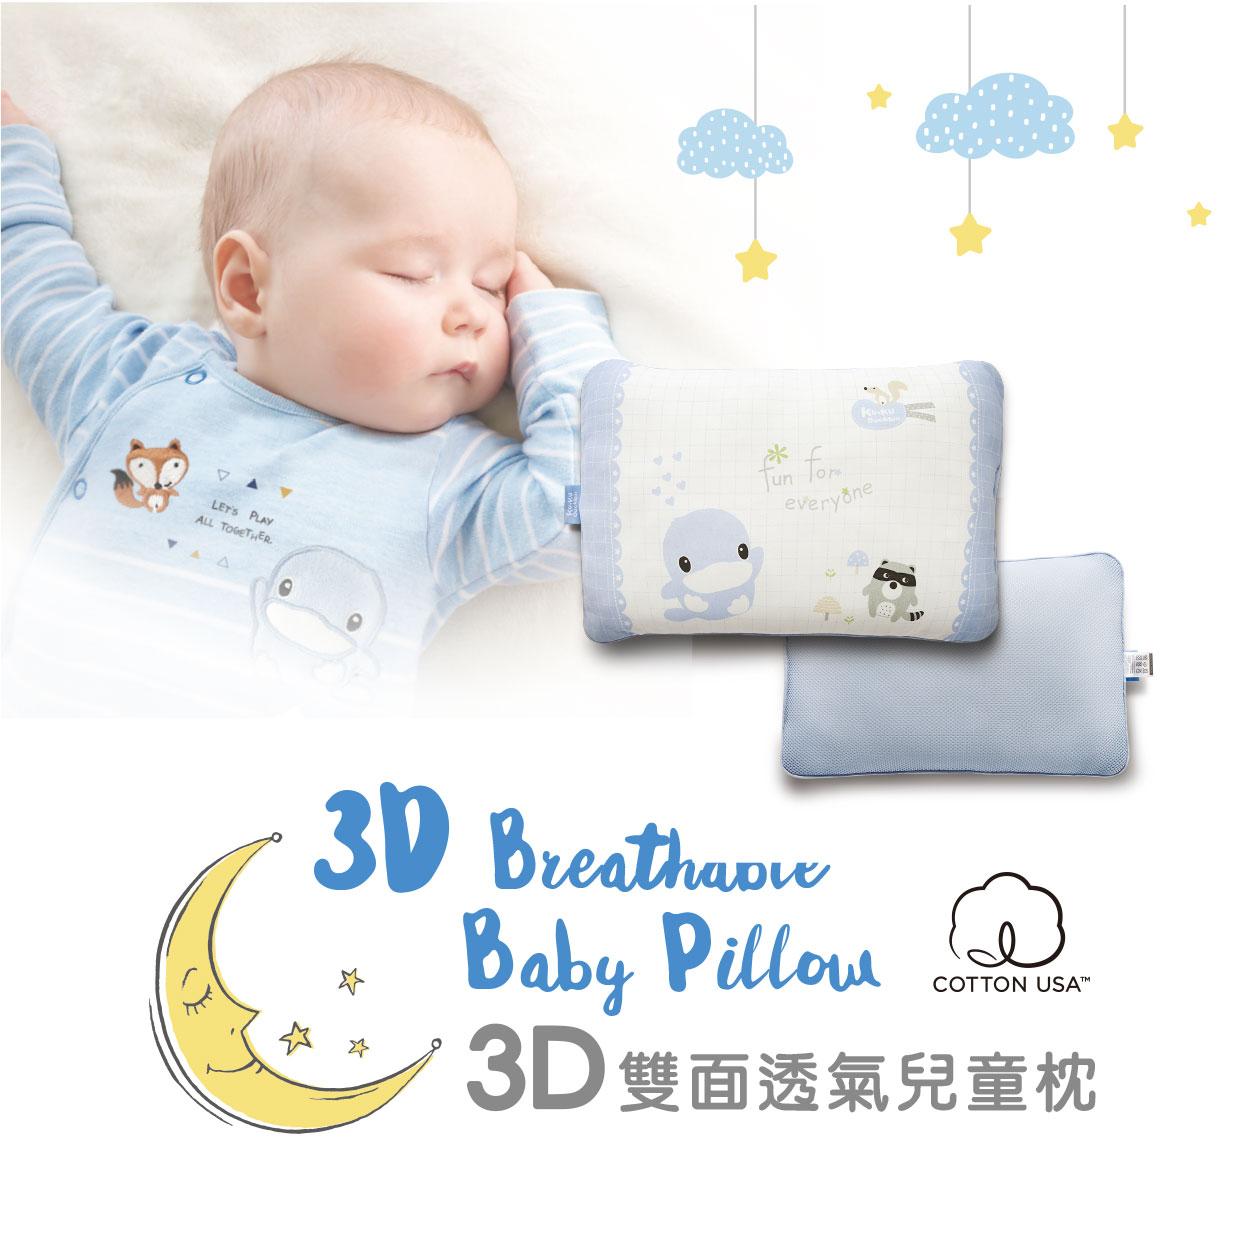 proimages/BeddingSeries/BabyPillows/2087/2087-edm-1.jpg